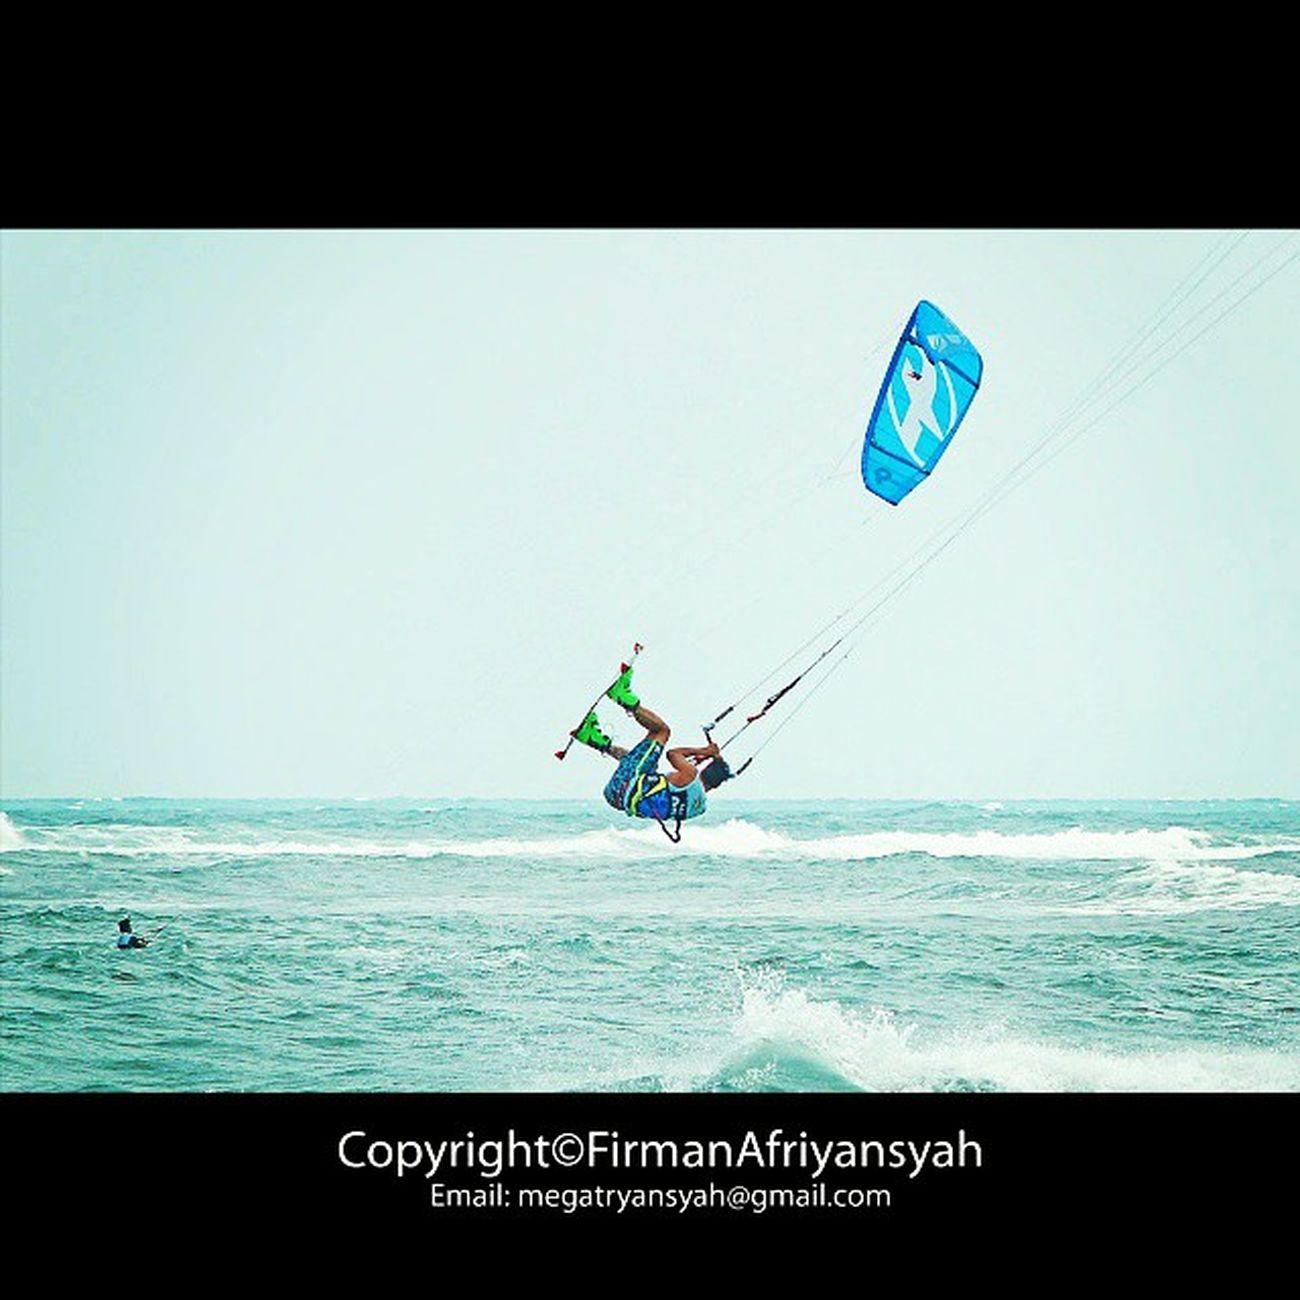 Bintan Kite Surfing Festival @lenovomobileid @instameetindonesia . ayuk ikut @robbihafzan130985 @andreasmessah @rudiiono @sotonkqu @yanisidi Lenovo_powerchallenge Lenovo_bodymove PowerForYourLife Lenovo_Instameet